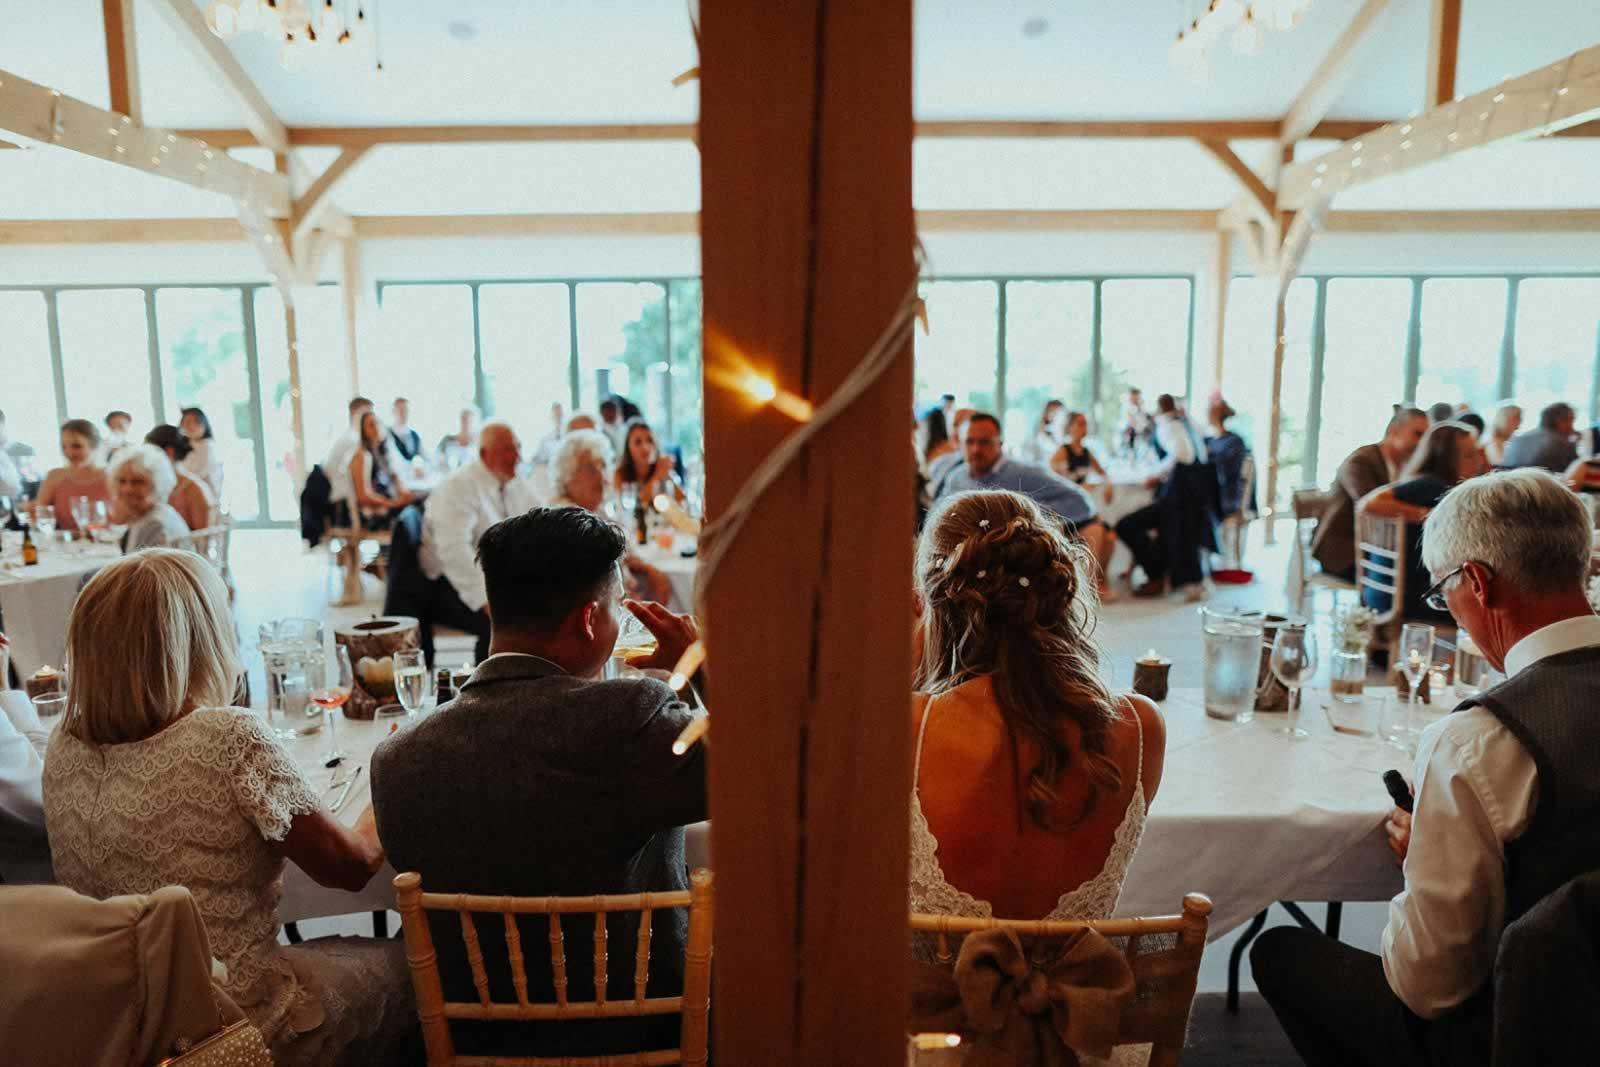 Pryors-Hayes-Wedding-Photography-Barn-Venue-Cheshire-embee-photography-0208.jpg